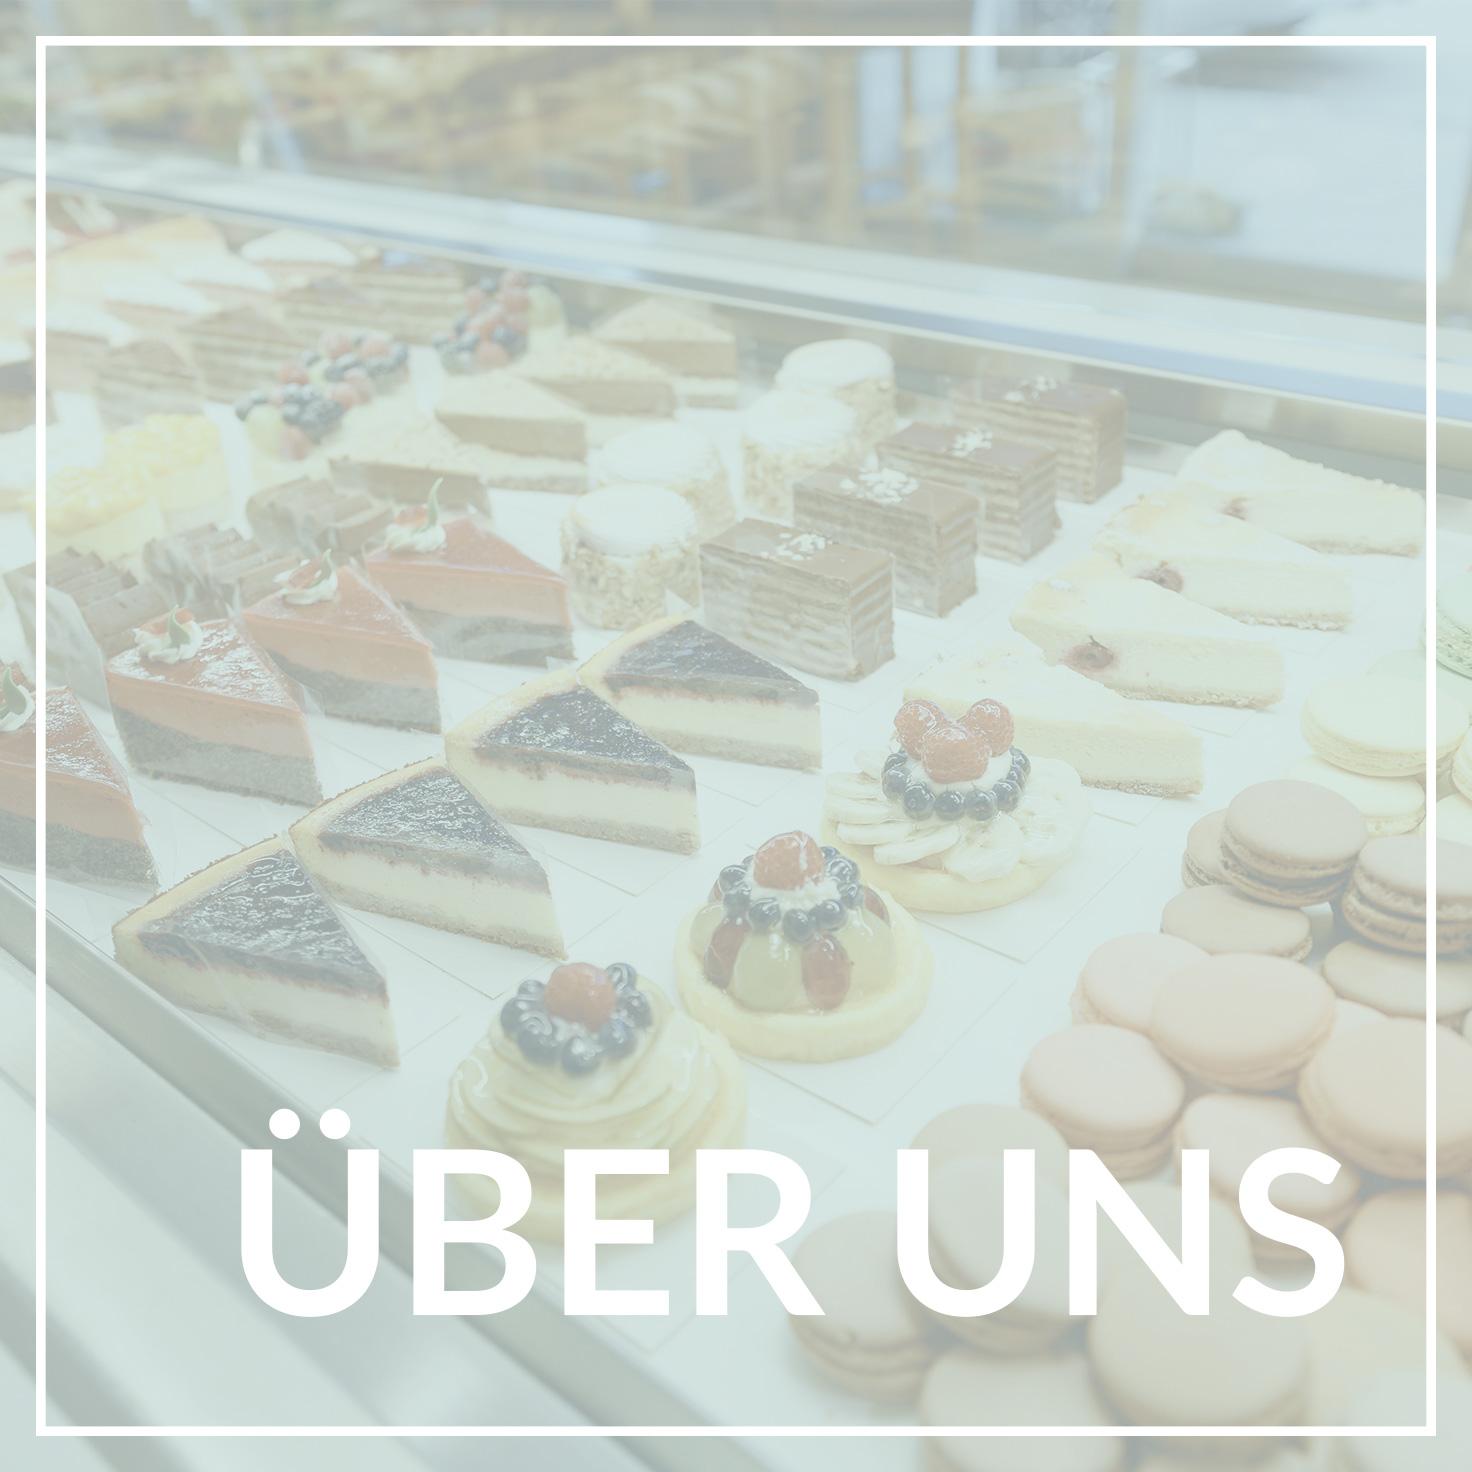 Heiss & Süß - Über uns